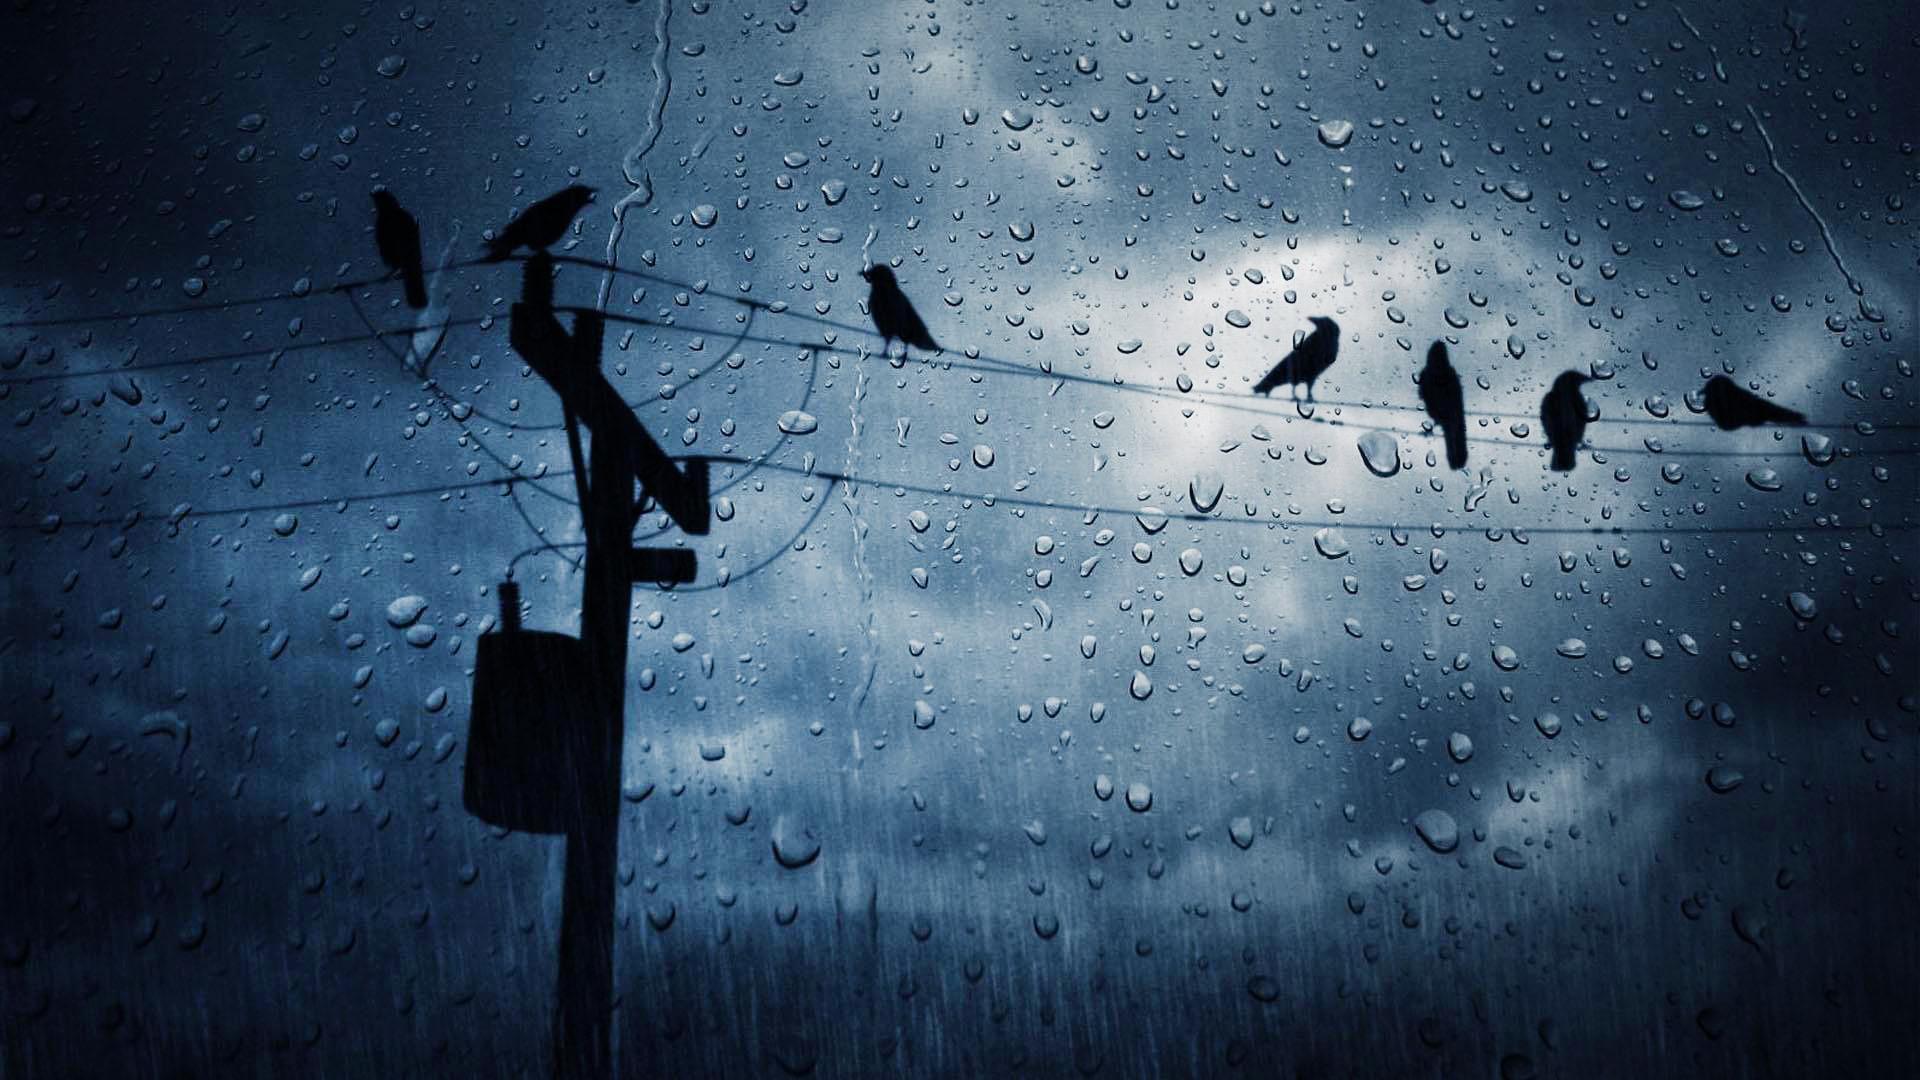 .com/nature/ocean-beach-rain-storm-